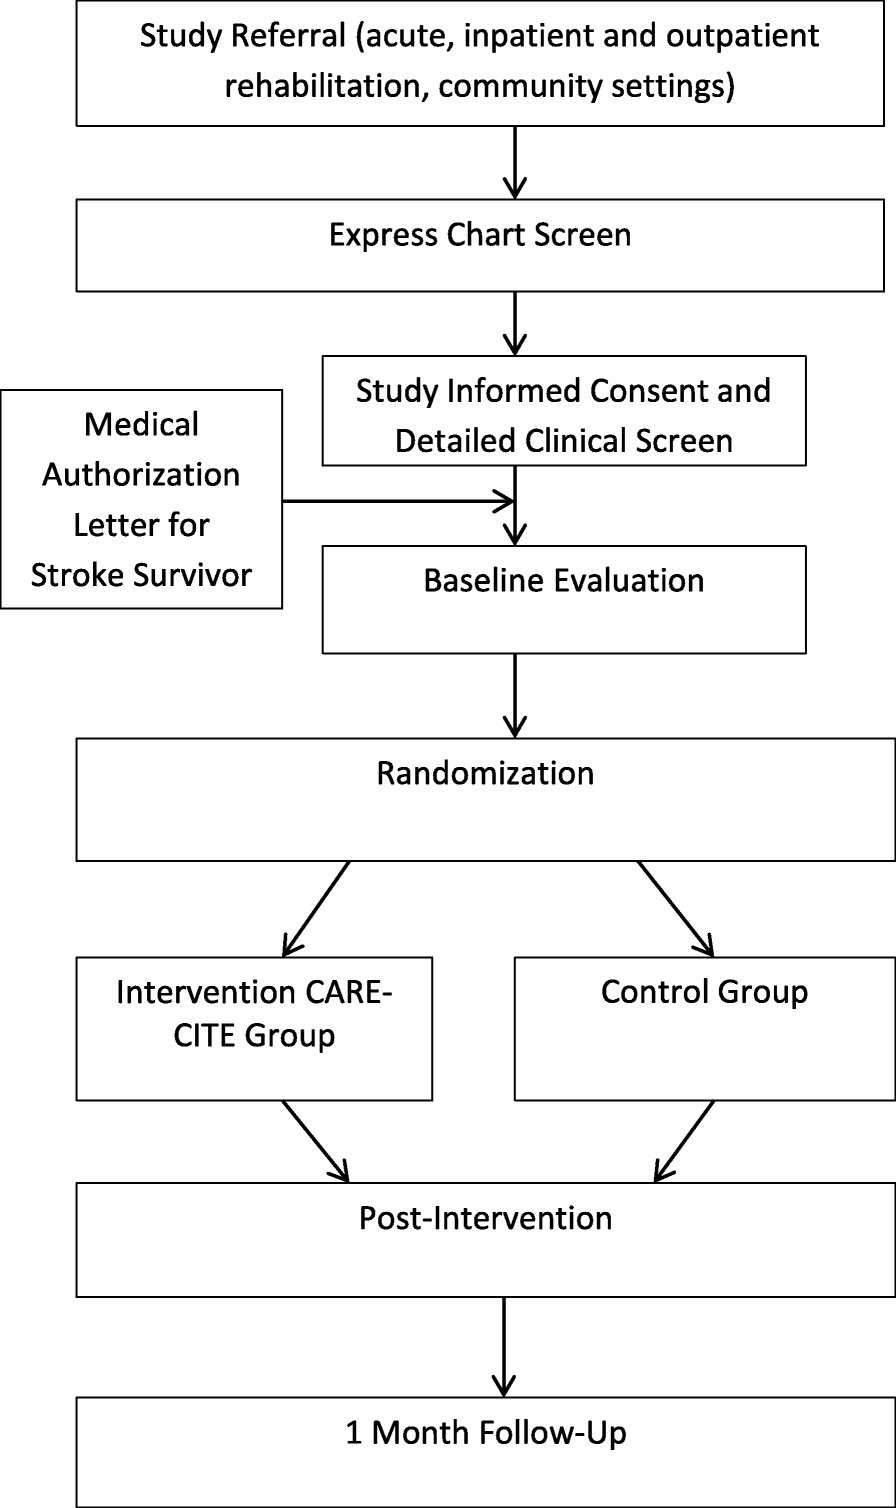 A web-based carepartner-integrated rehabilitation program